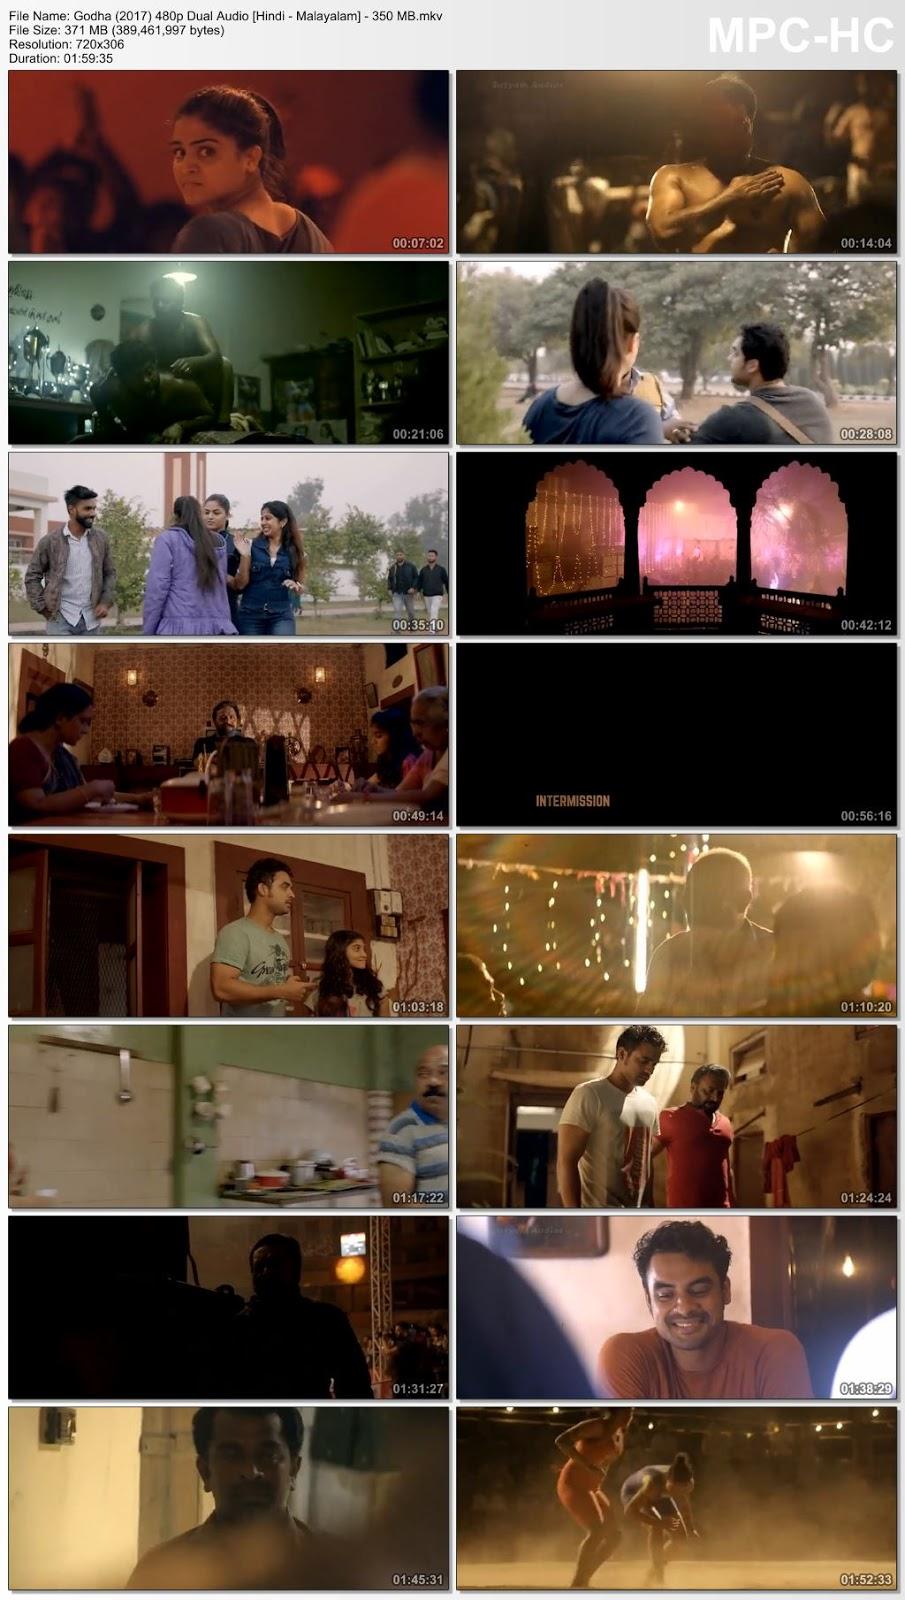 Godha (2017) 480p Dual Audio [Hindi – Malayalam] – 350 MB Desirehub